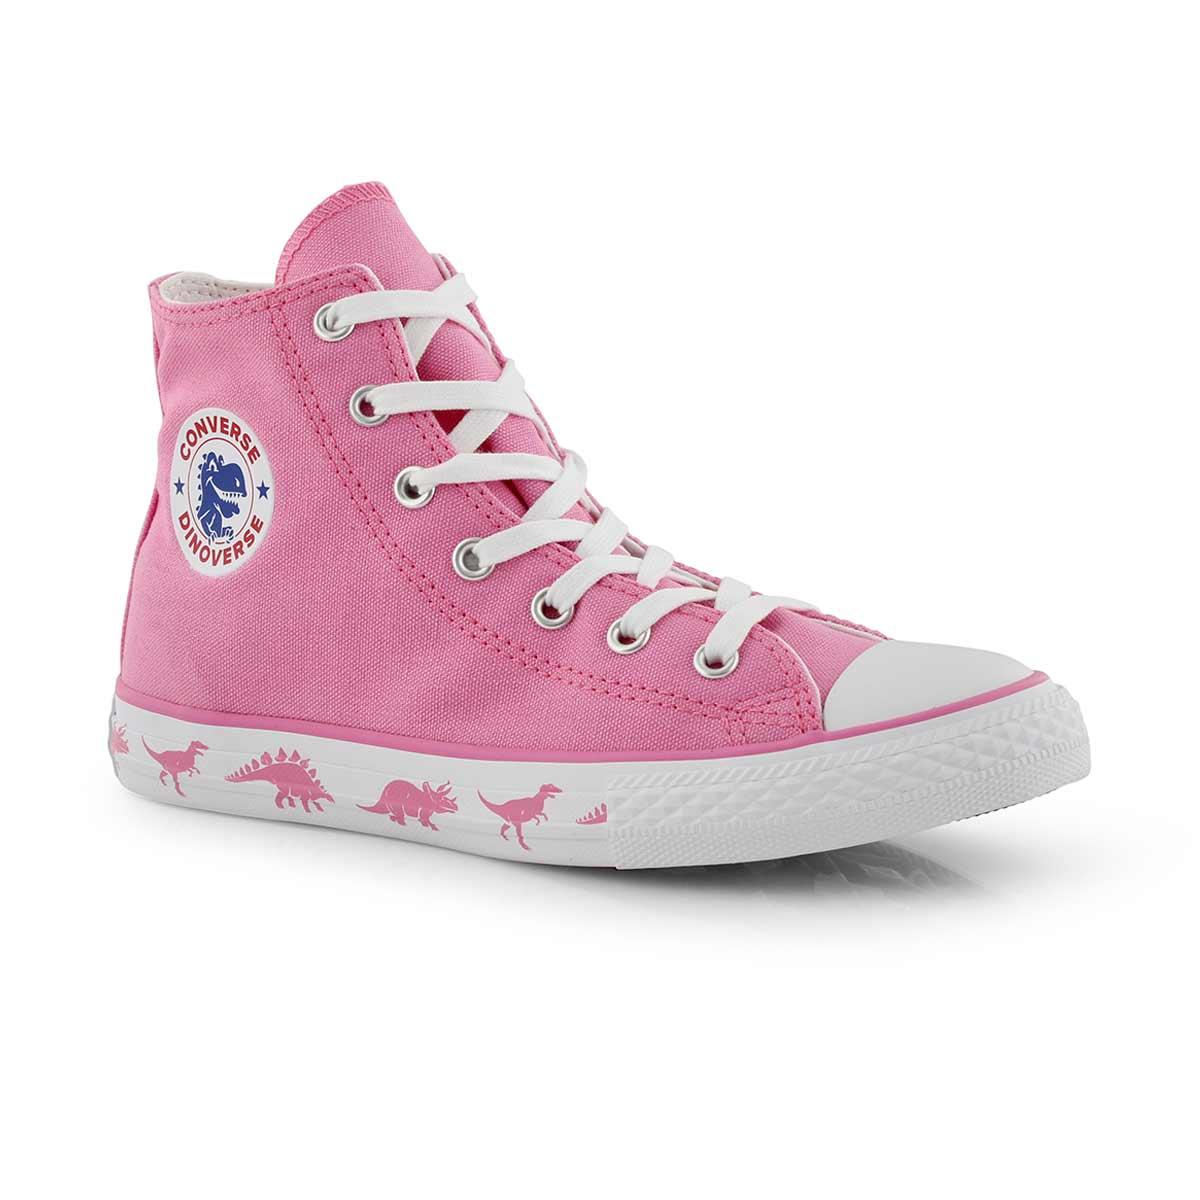 Grls CTAS Dinoverse pink/wht hi top